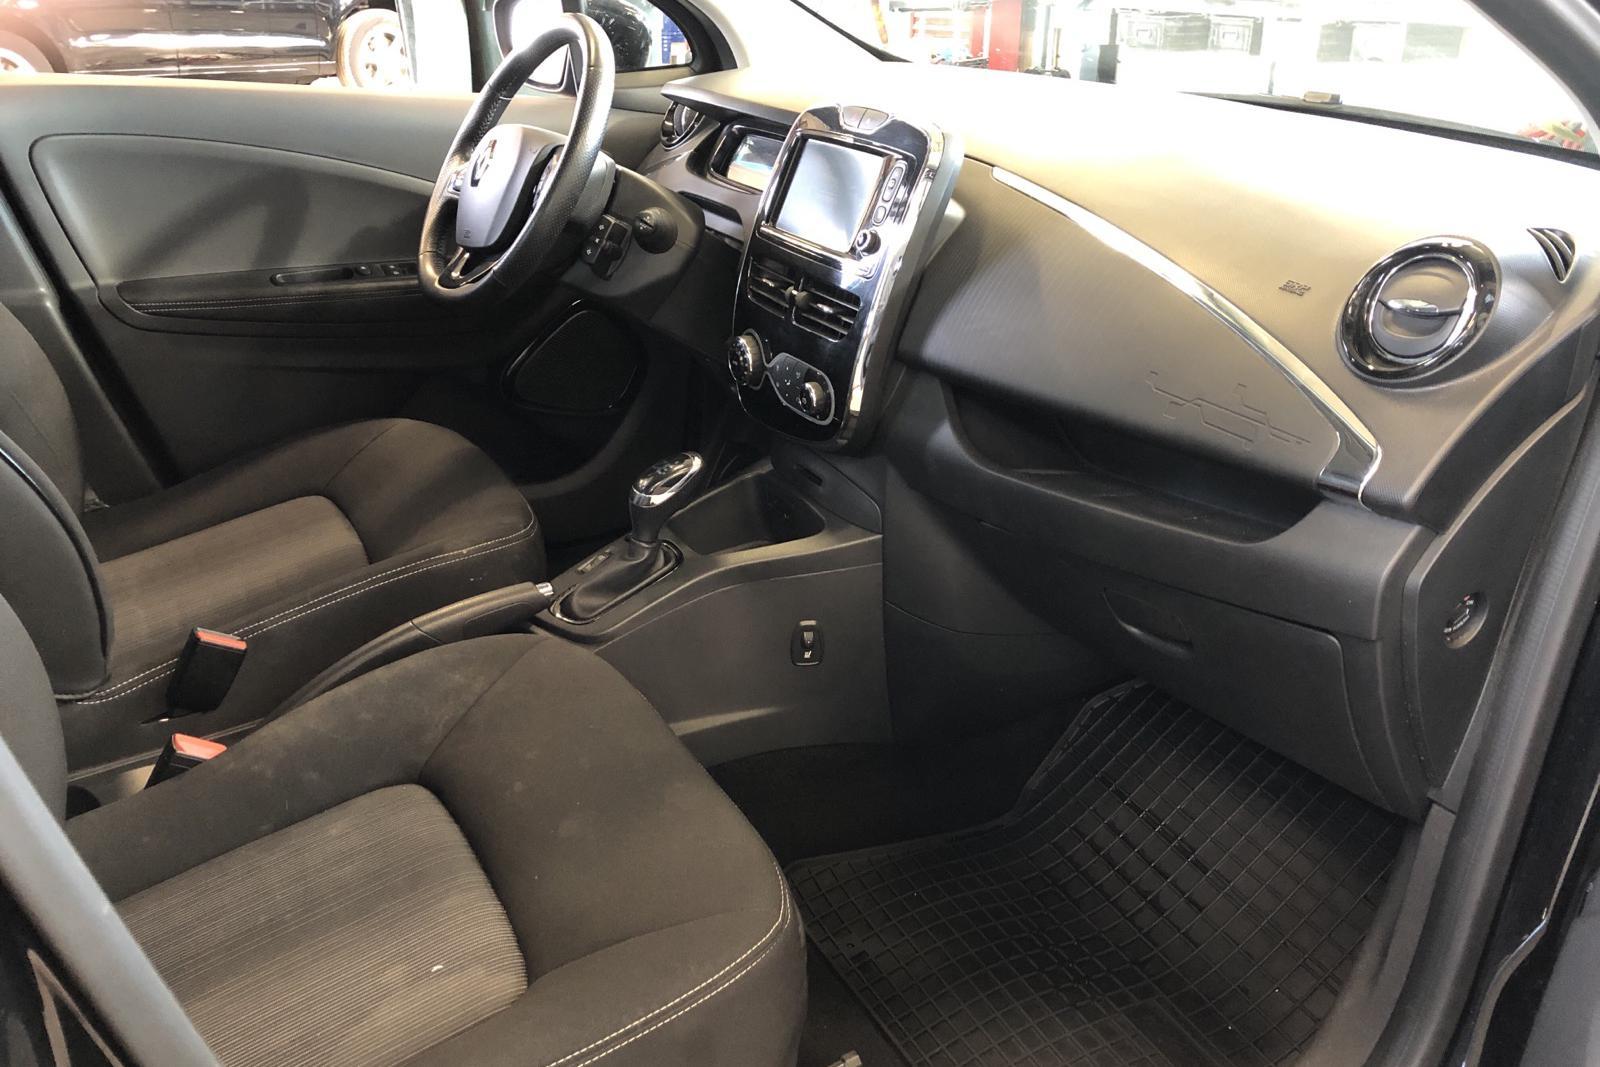 Renault Zoe 41 kWh R110 (108hk) - 6 412 mil - Automat - svart - 2019